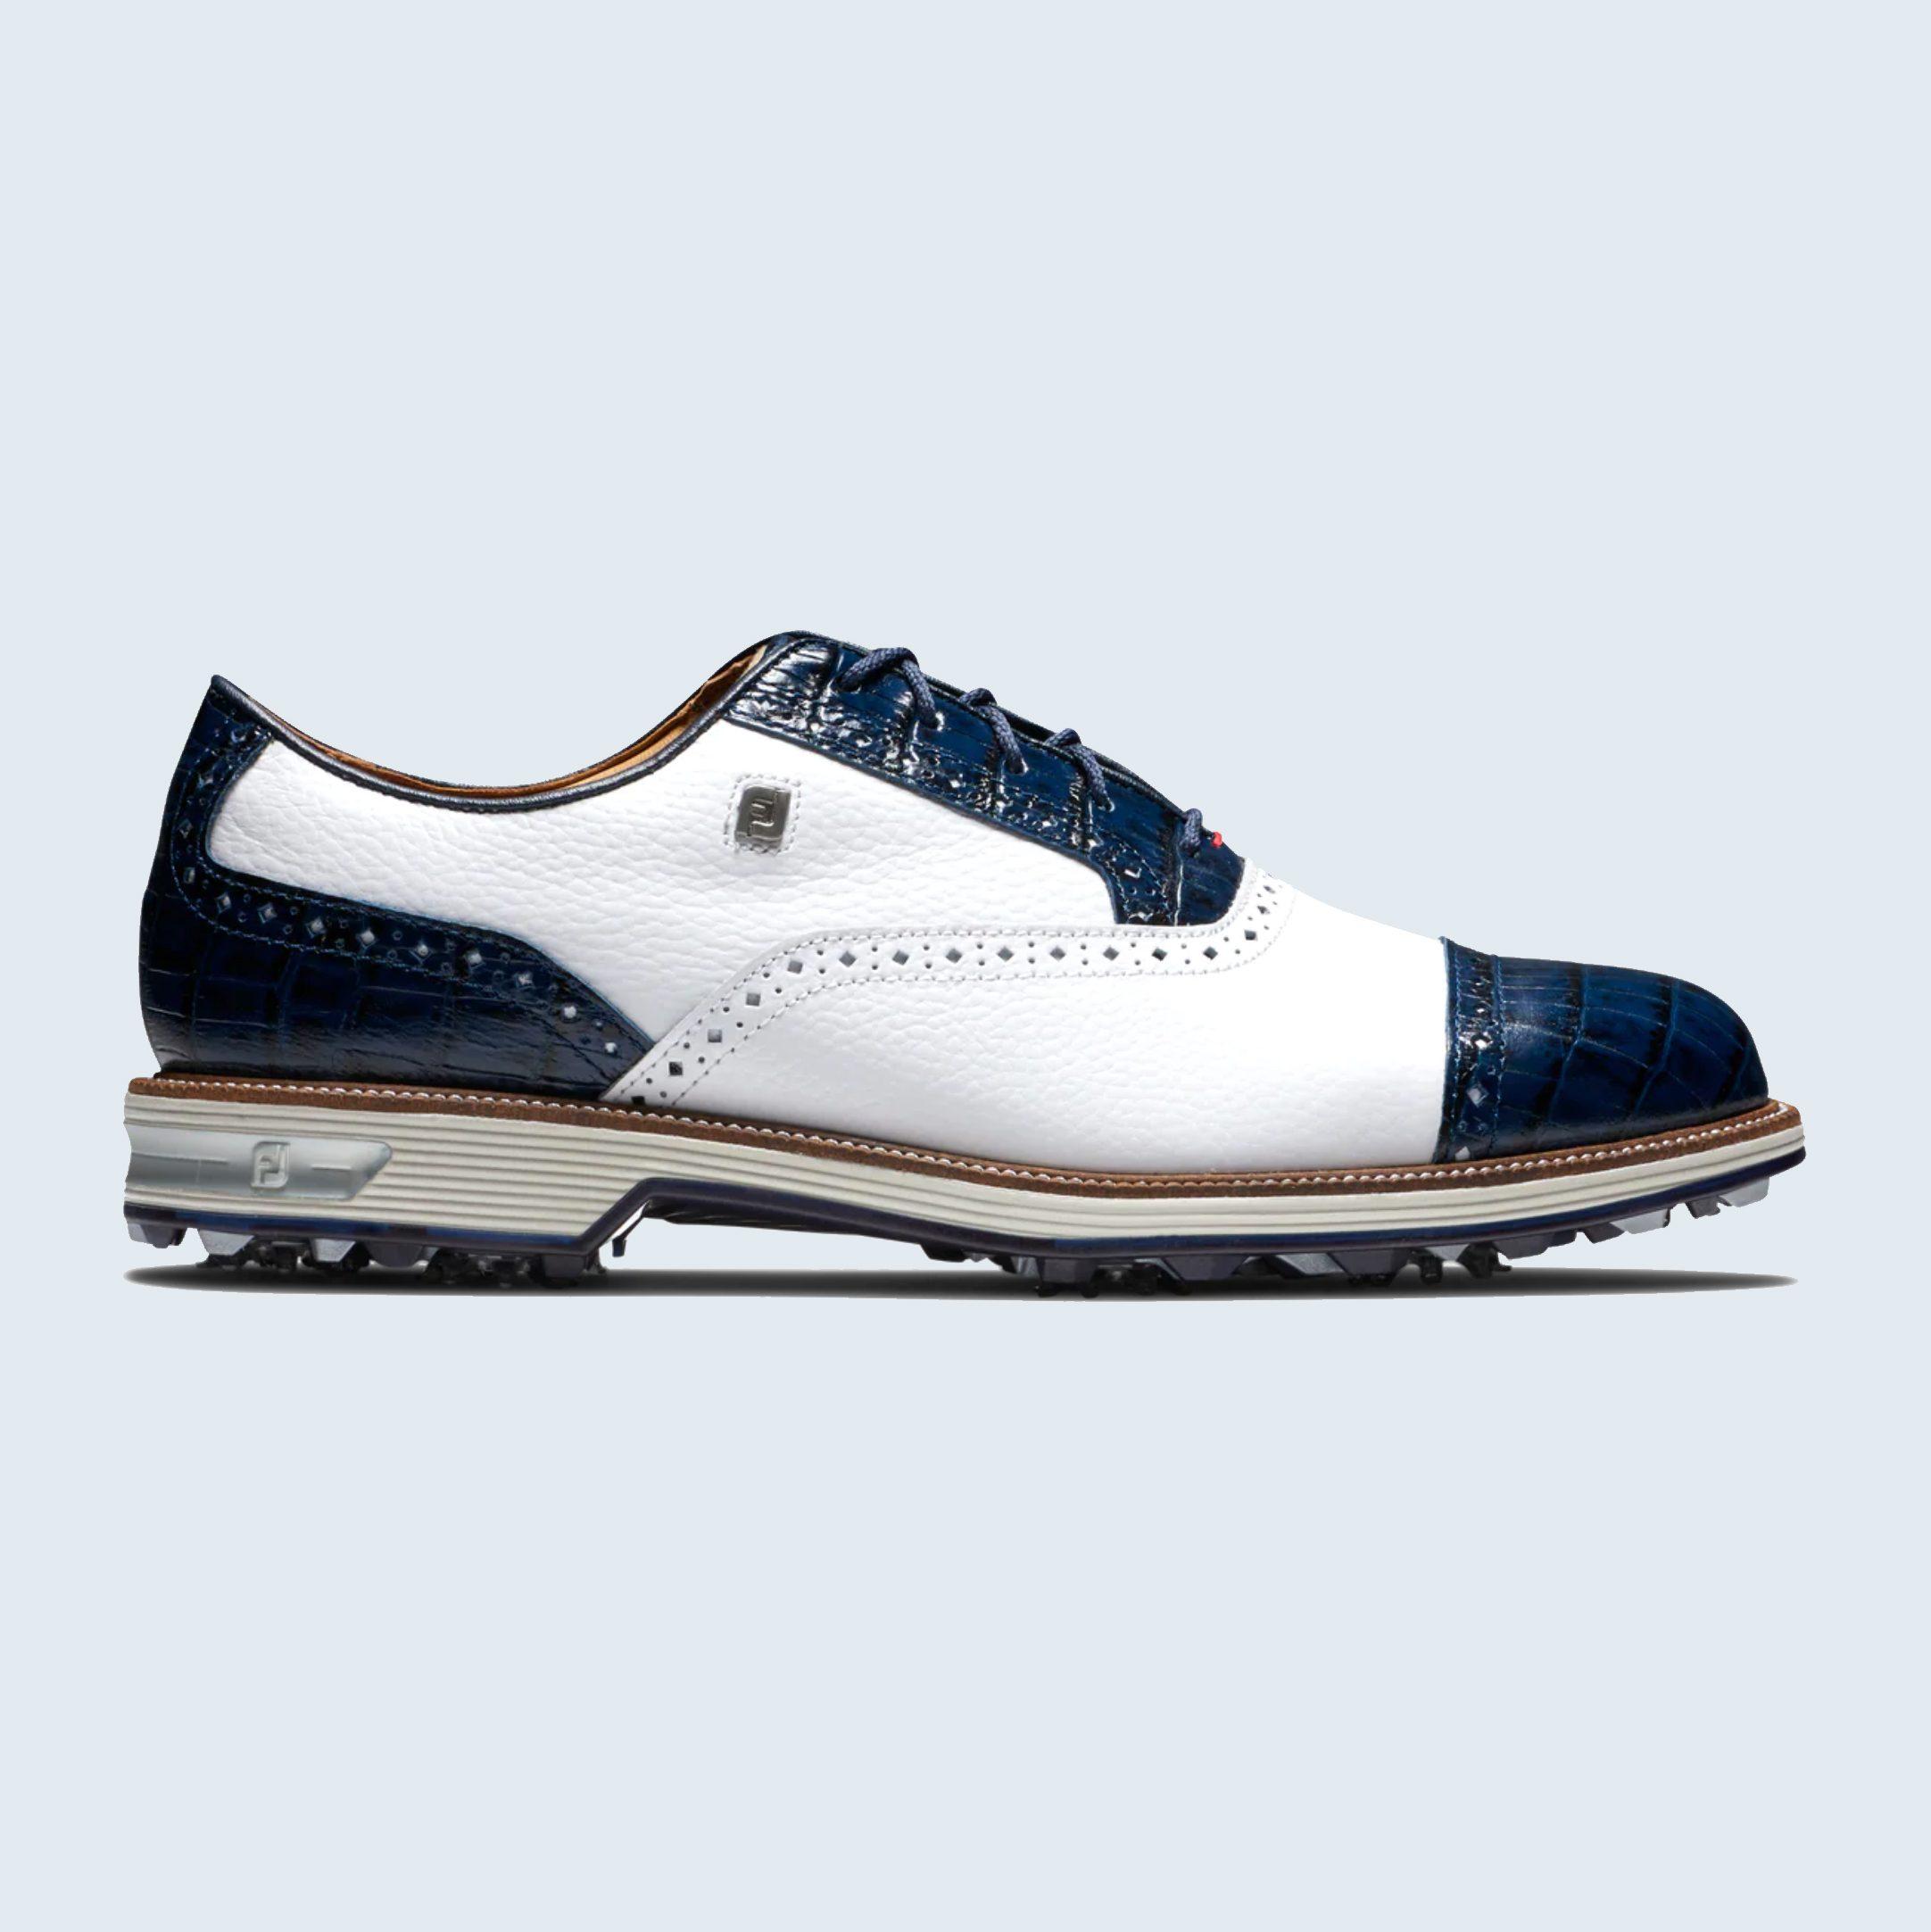 FootJoy Premiere Series Tarlow Shoes